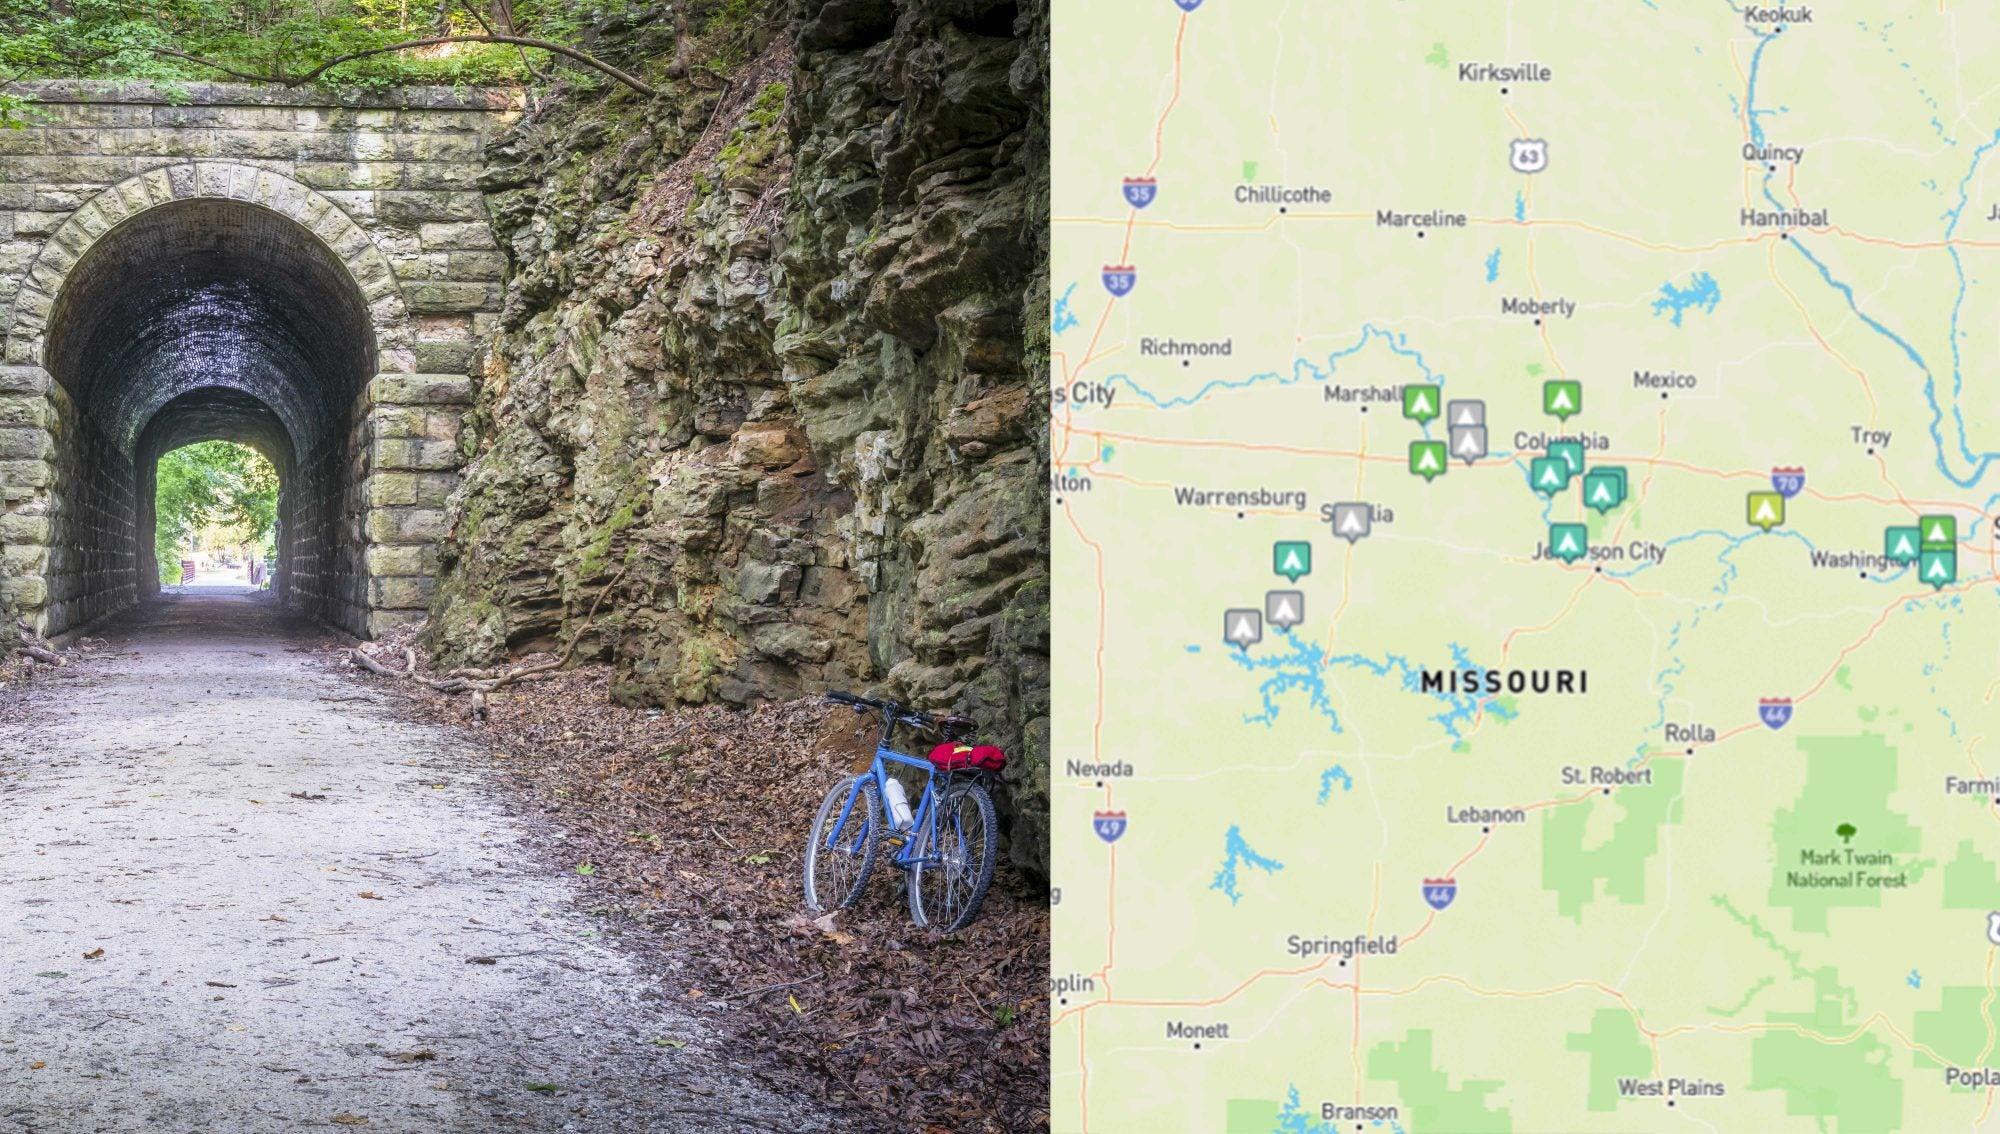 katy trail camping map